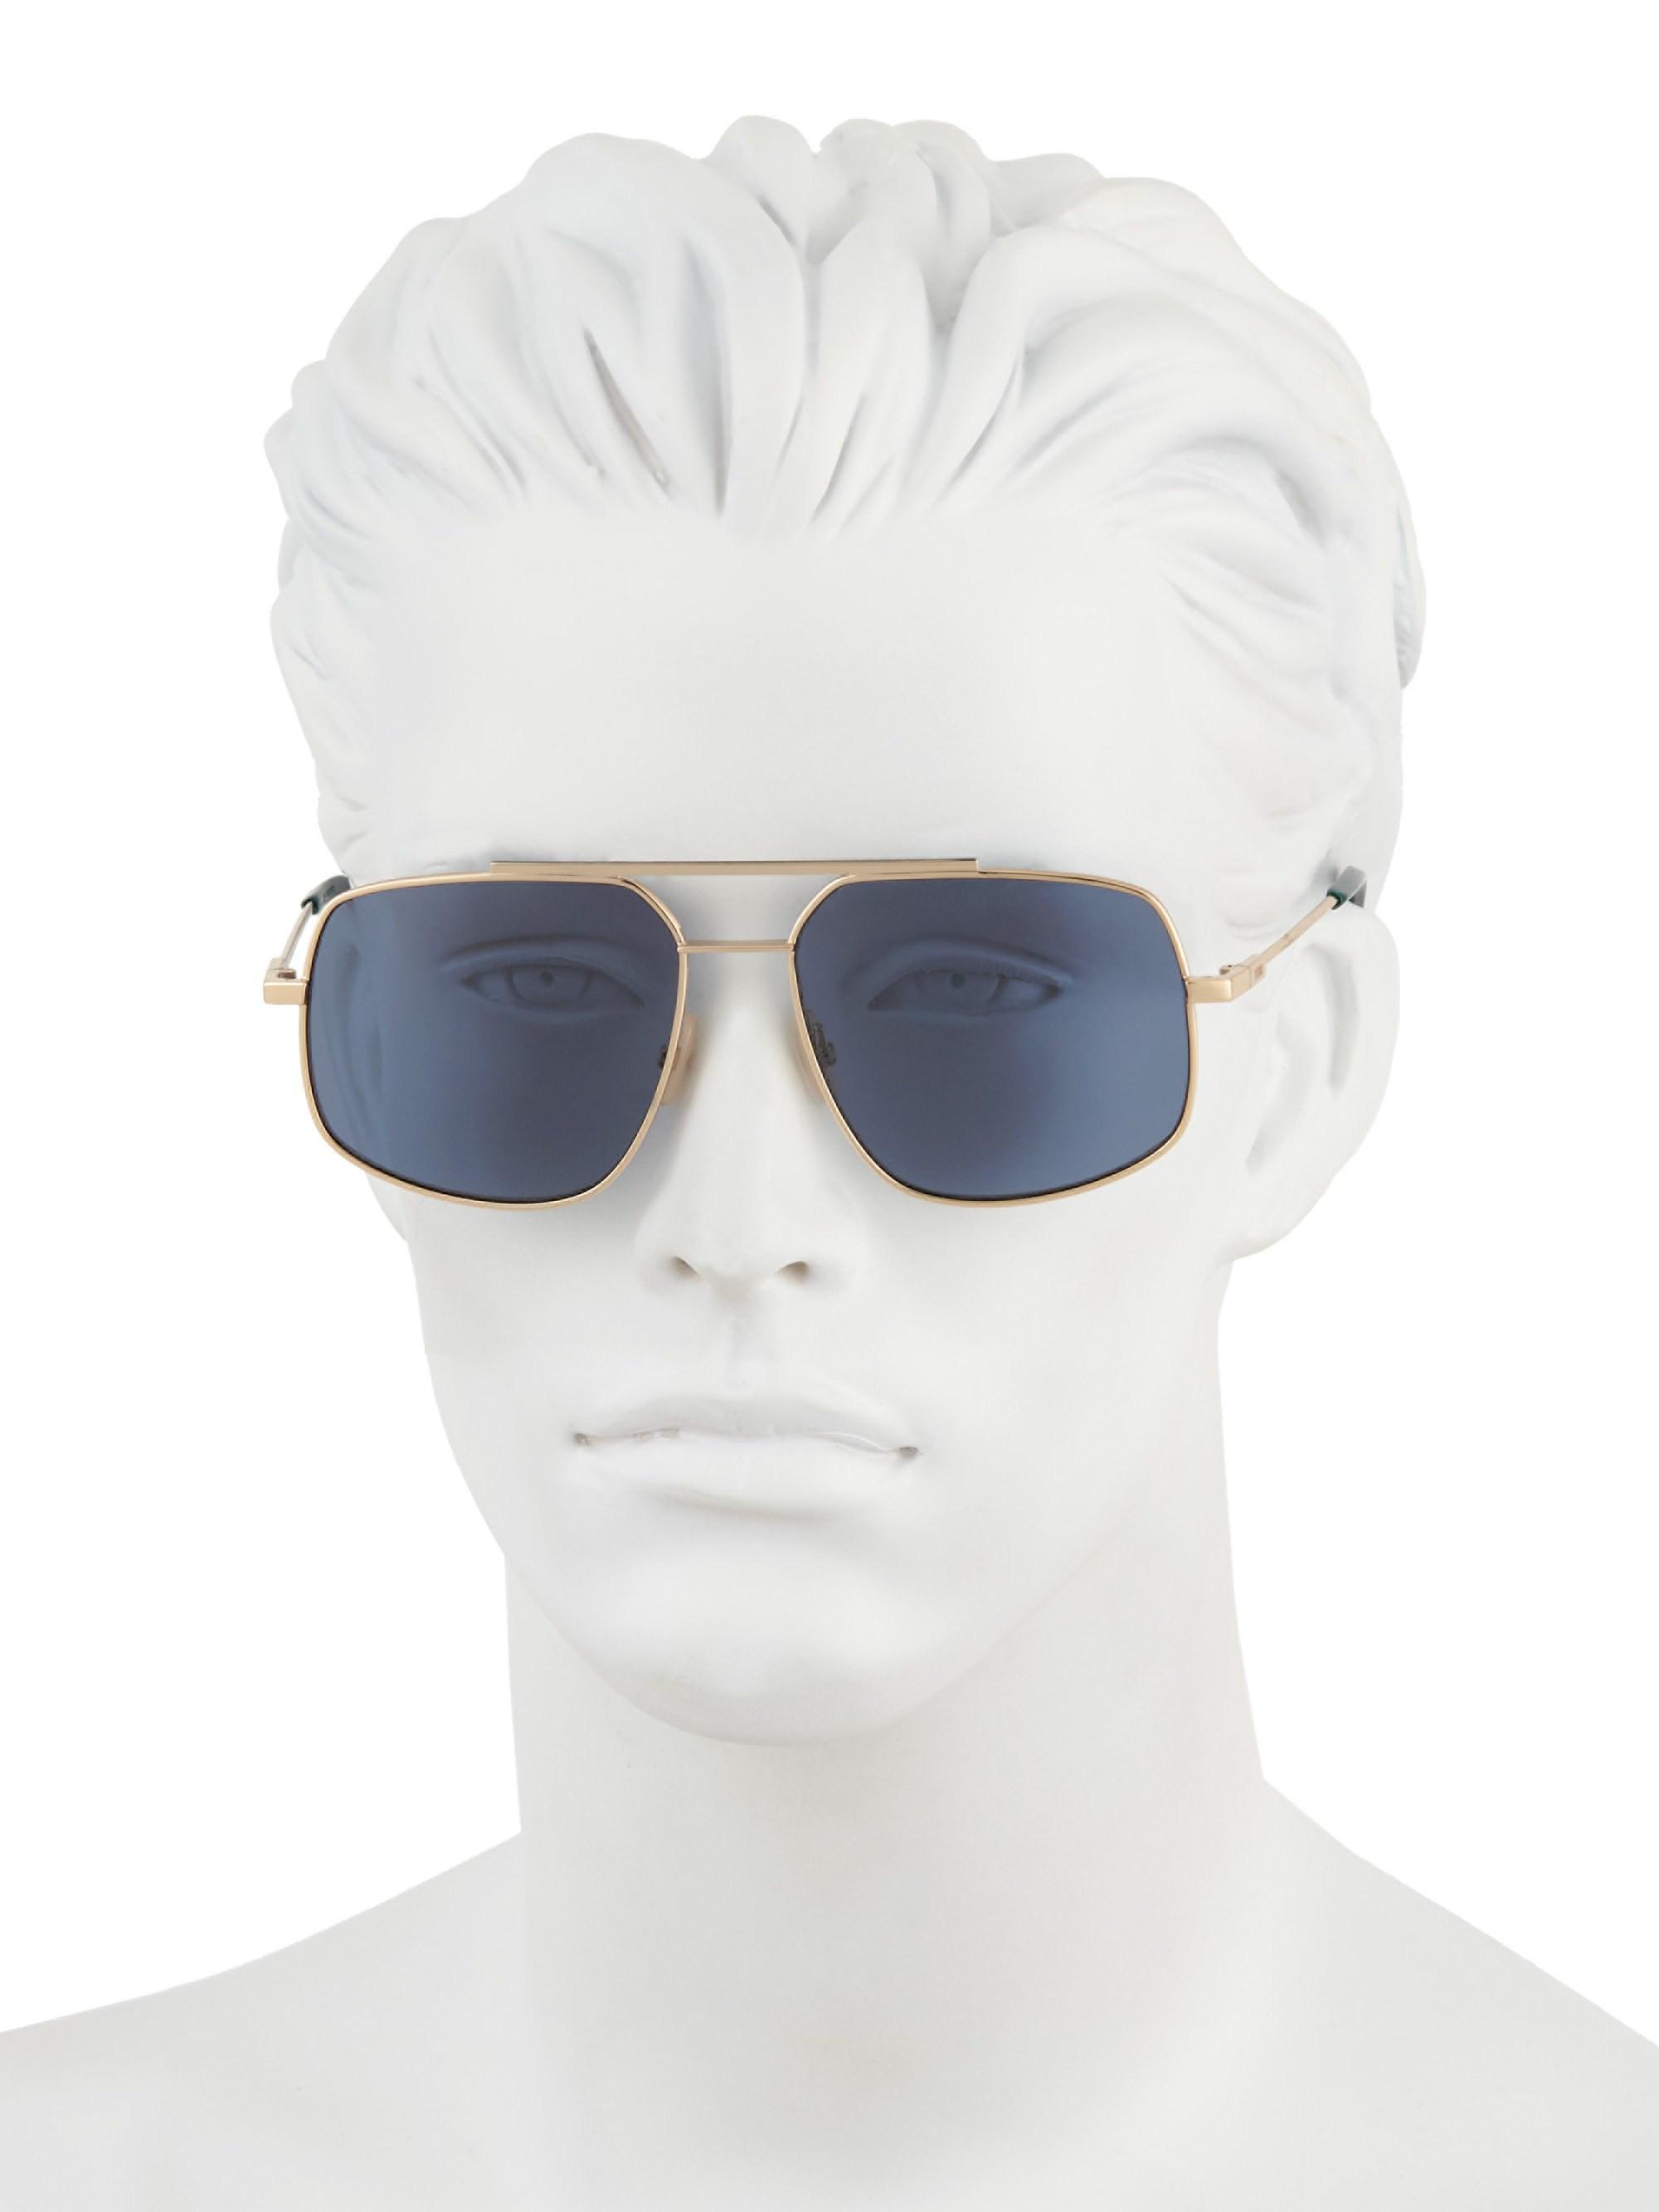 53860f4eb694 Fendi - Women s 58mm Square Sunglasses - Blue - Lyst. View fullscreen